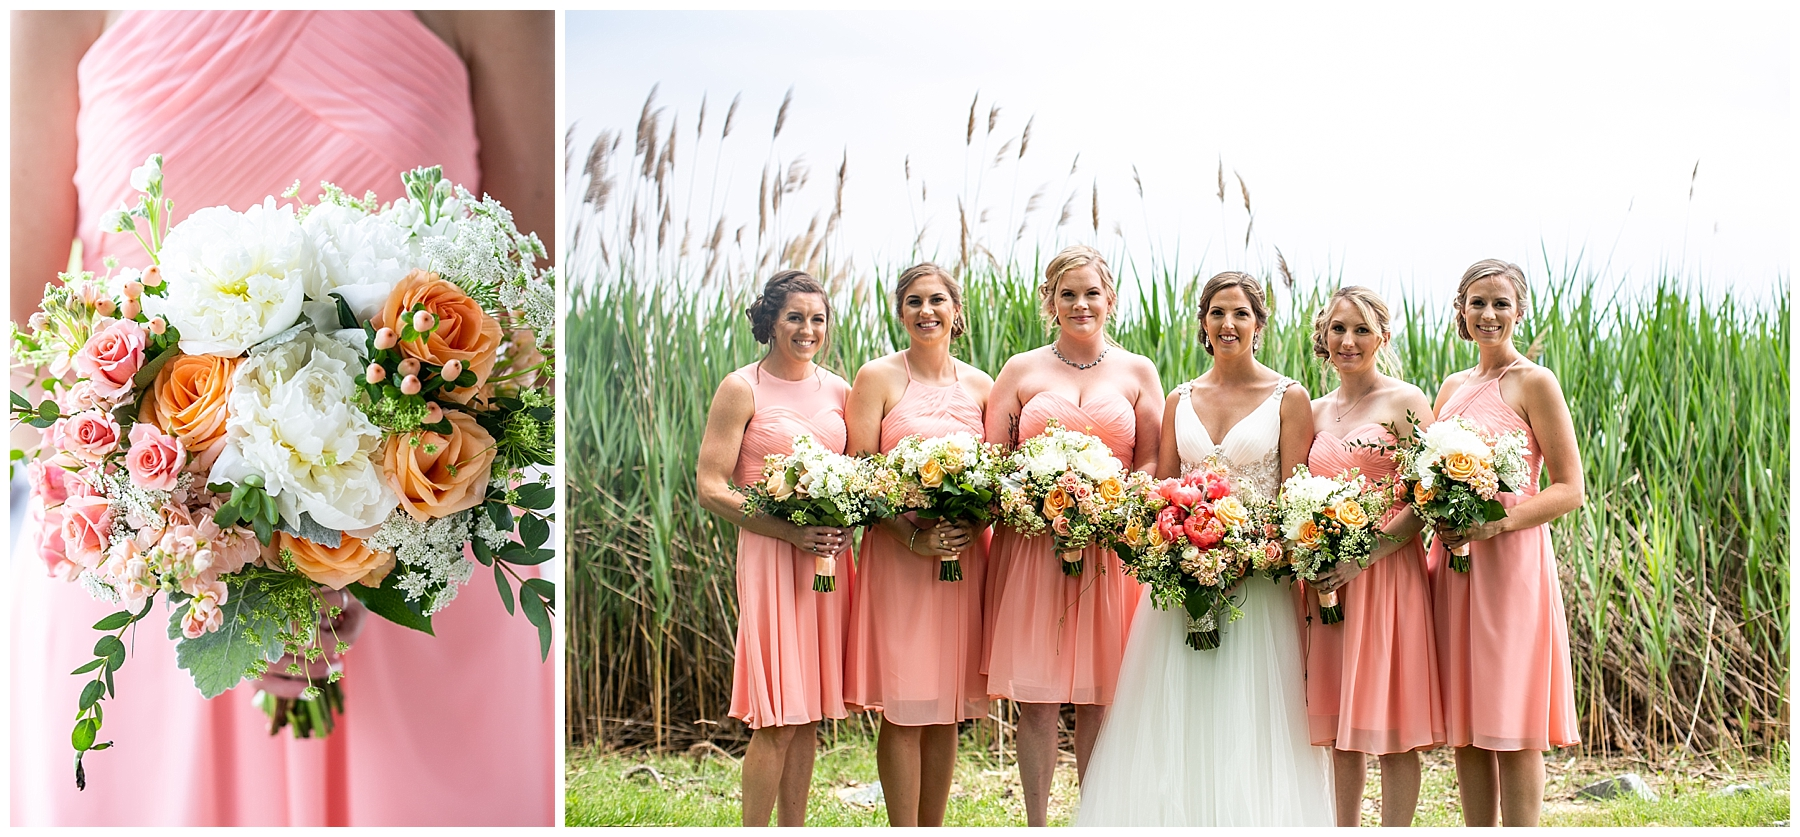 Chelsea Phil Bohemia River Overlook Wedding Living Radiant Photography photos_0058.jpg